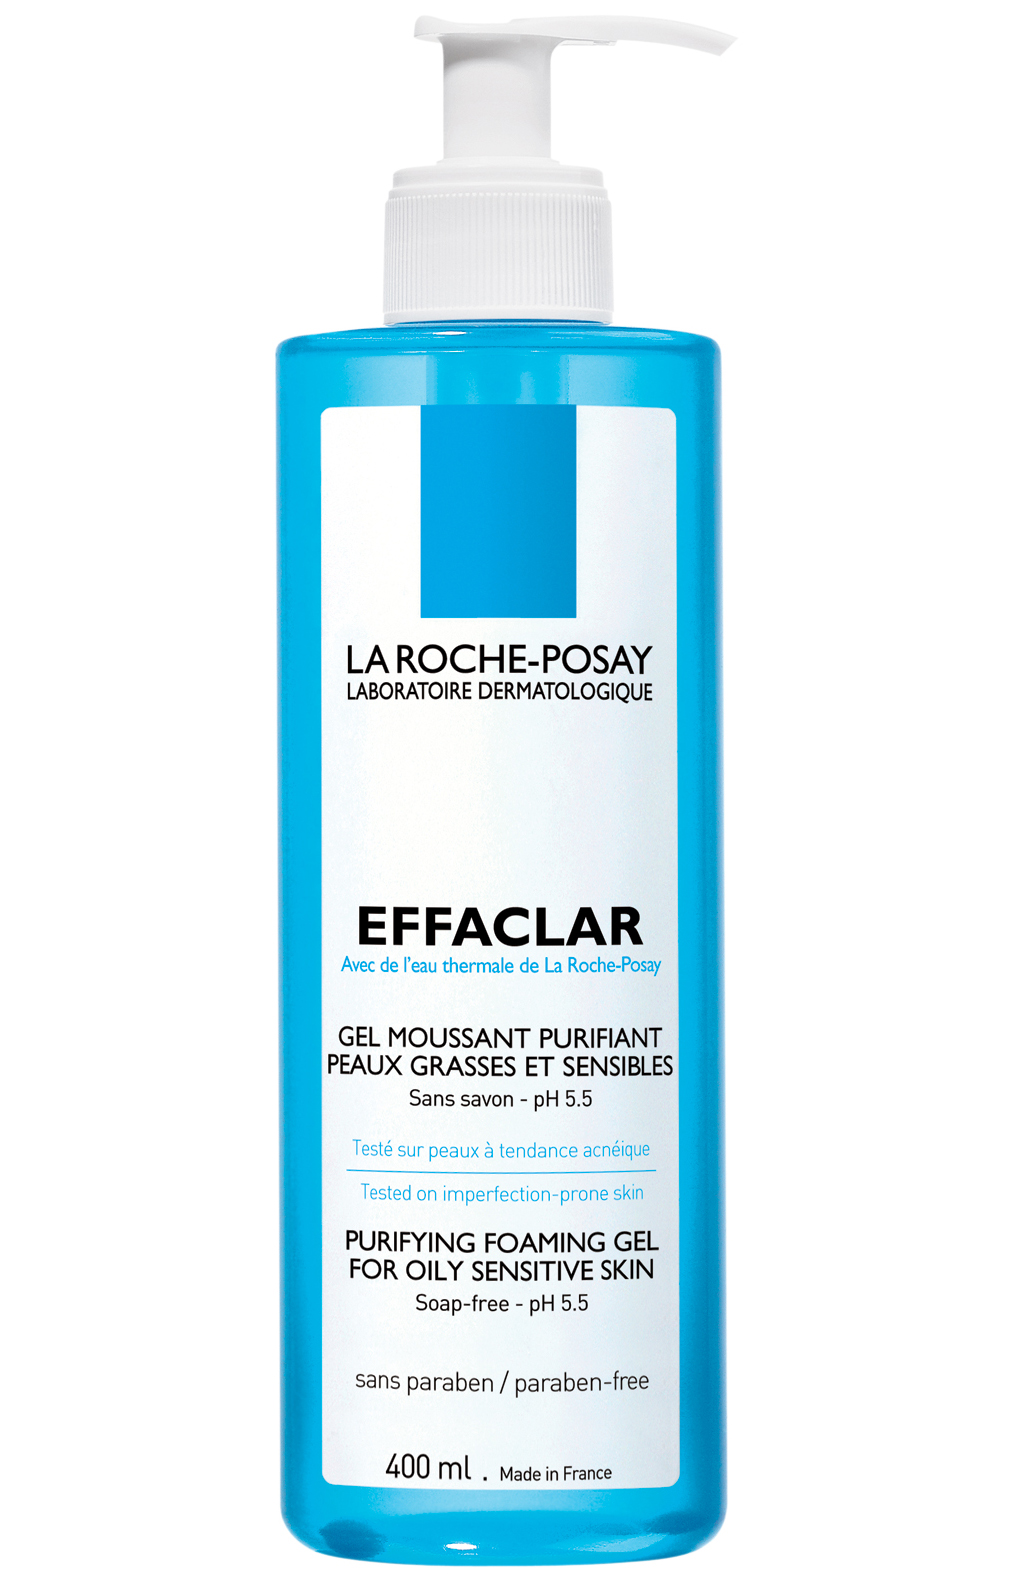 La Roche-Posay Effaclar Gel Moussant Purifiant Gel Καθαρισμού Για Λιπαρό Ευαίσθητο Δέρμα 400ml